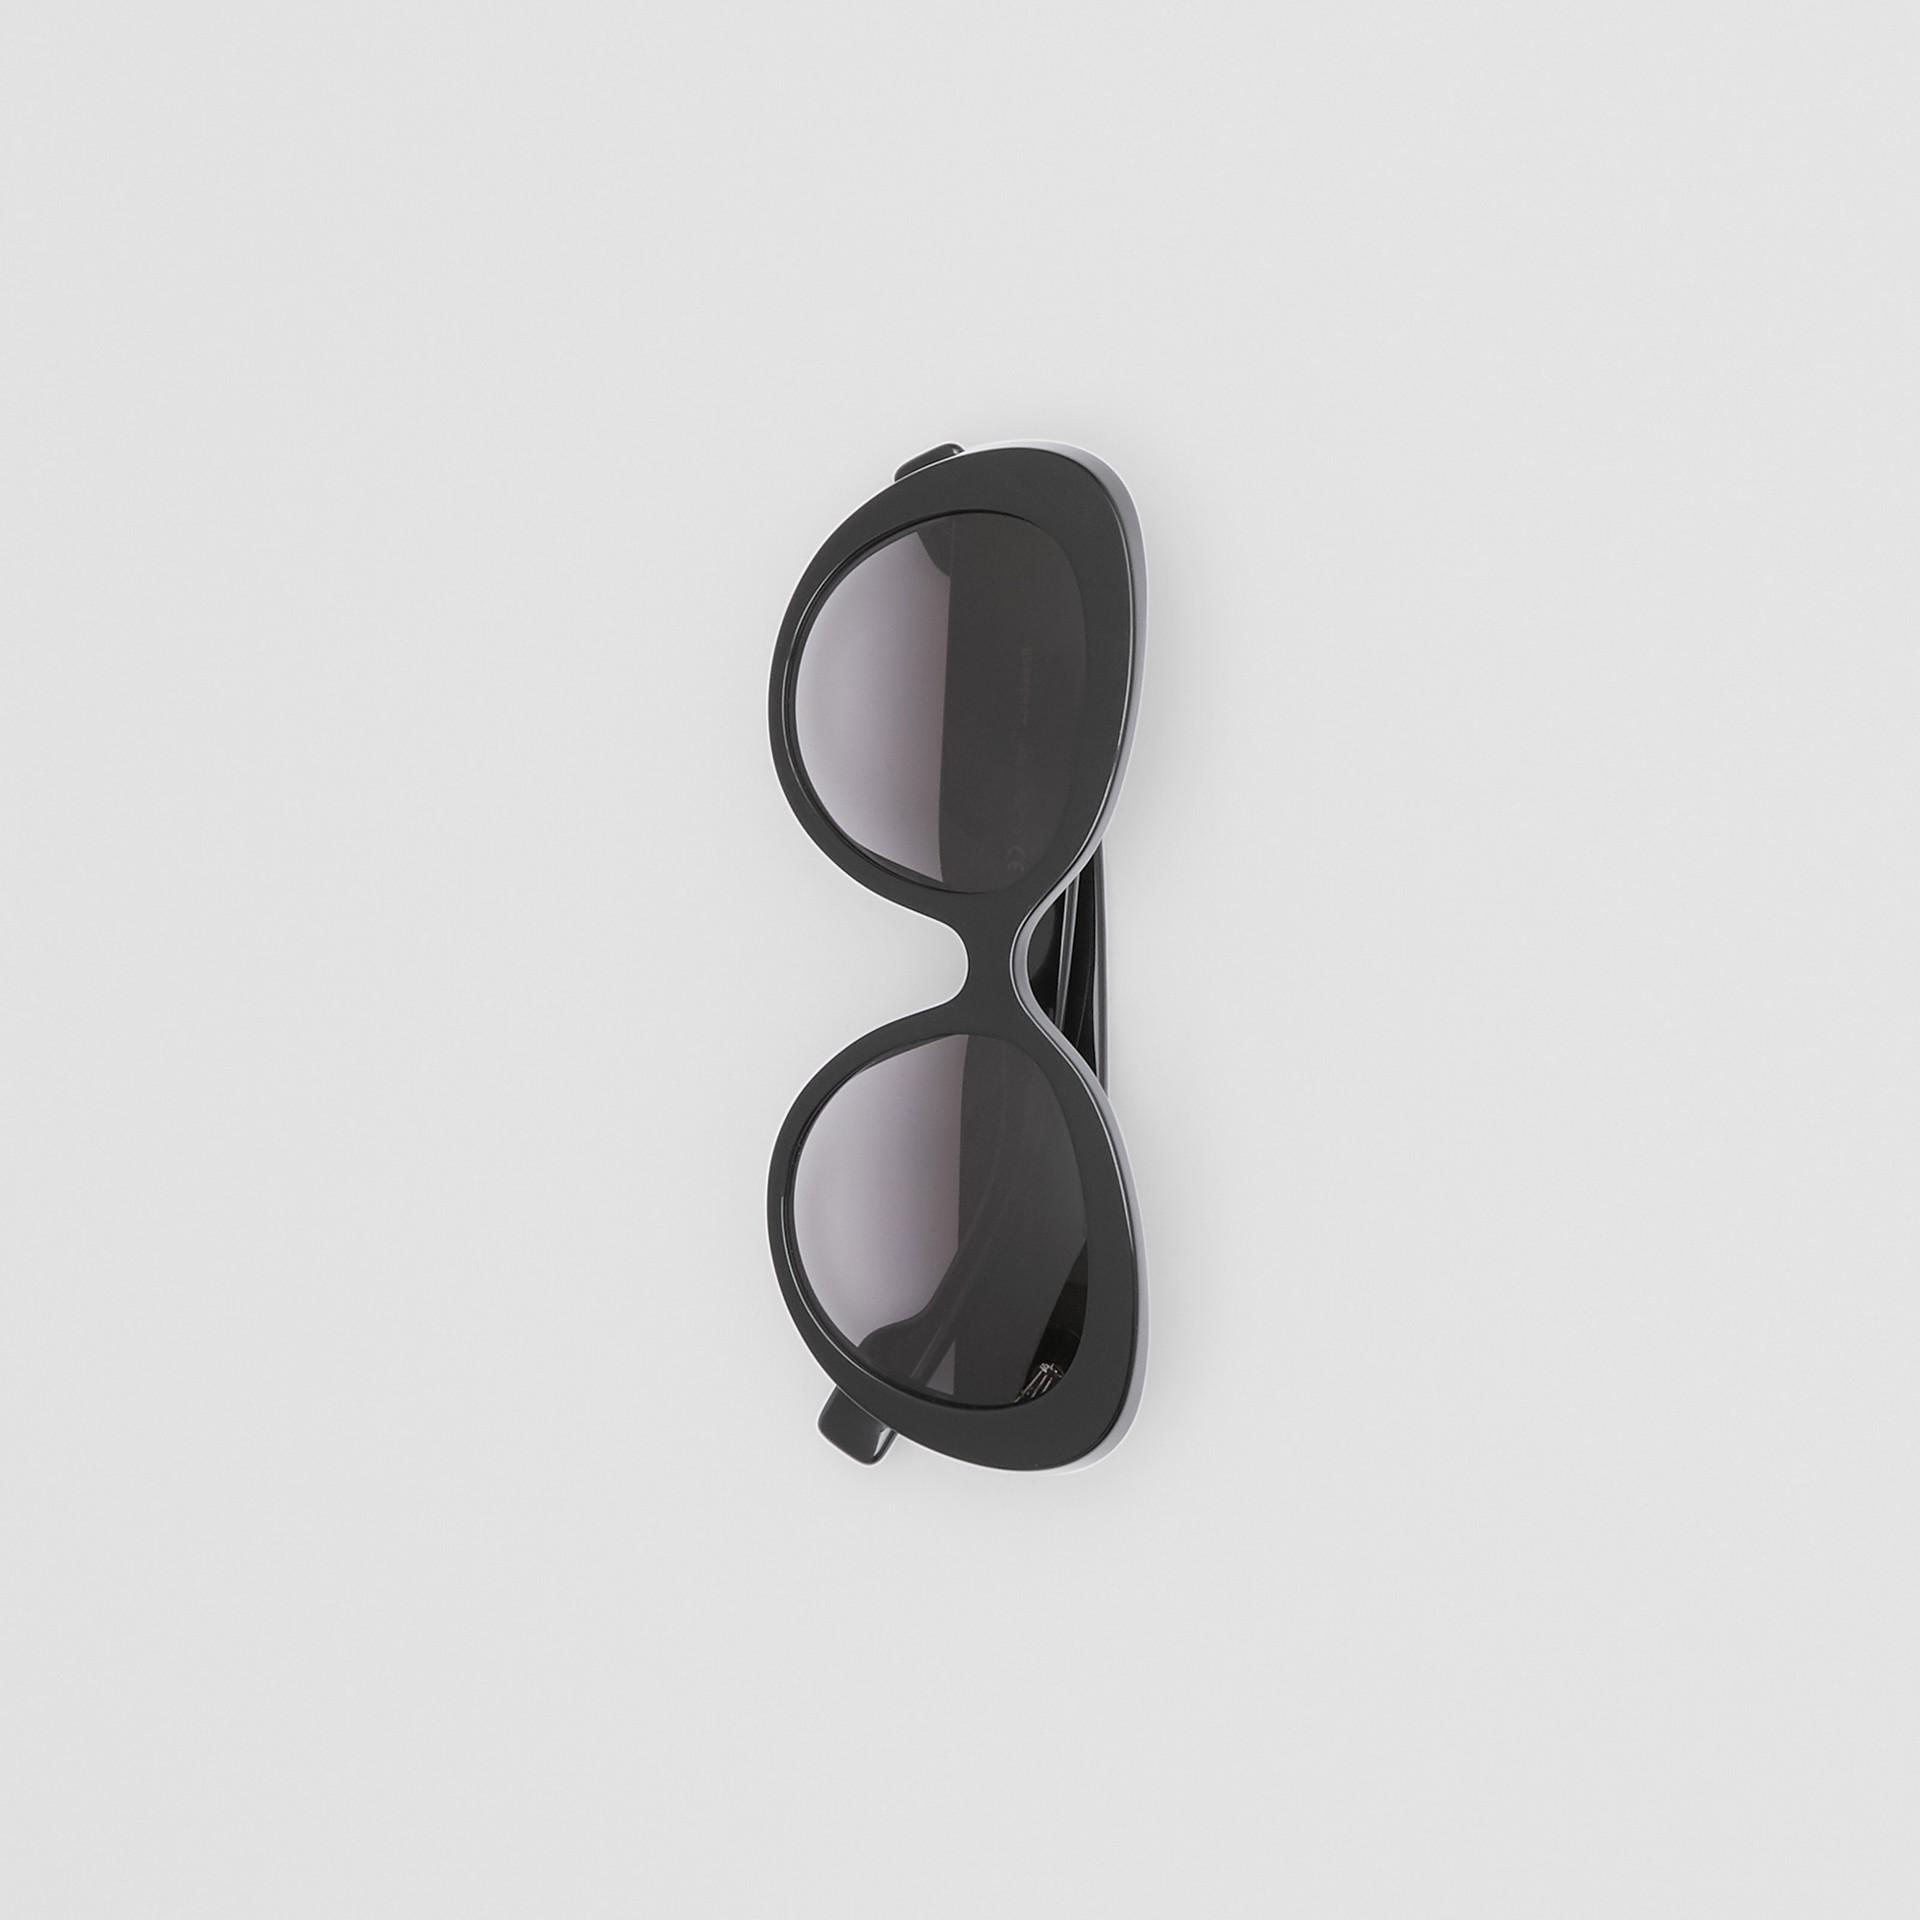 Monogram Motif Cat-eye Frame Sunglasses in Black - Women | Burberry - gallery image 2